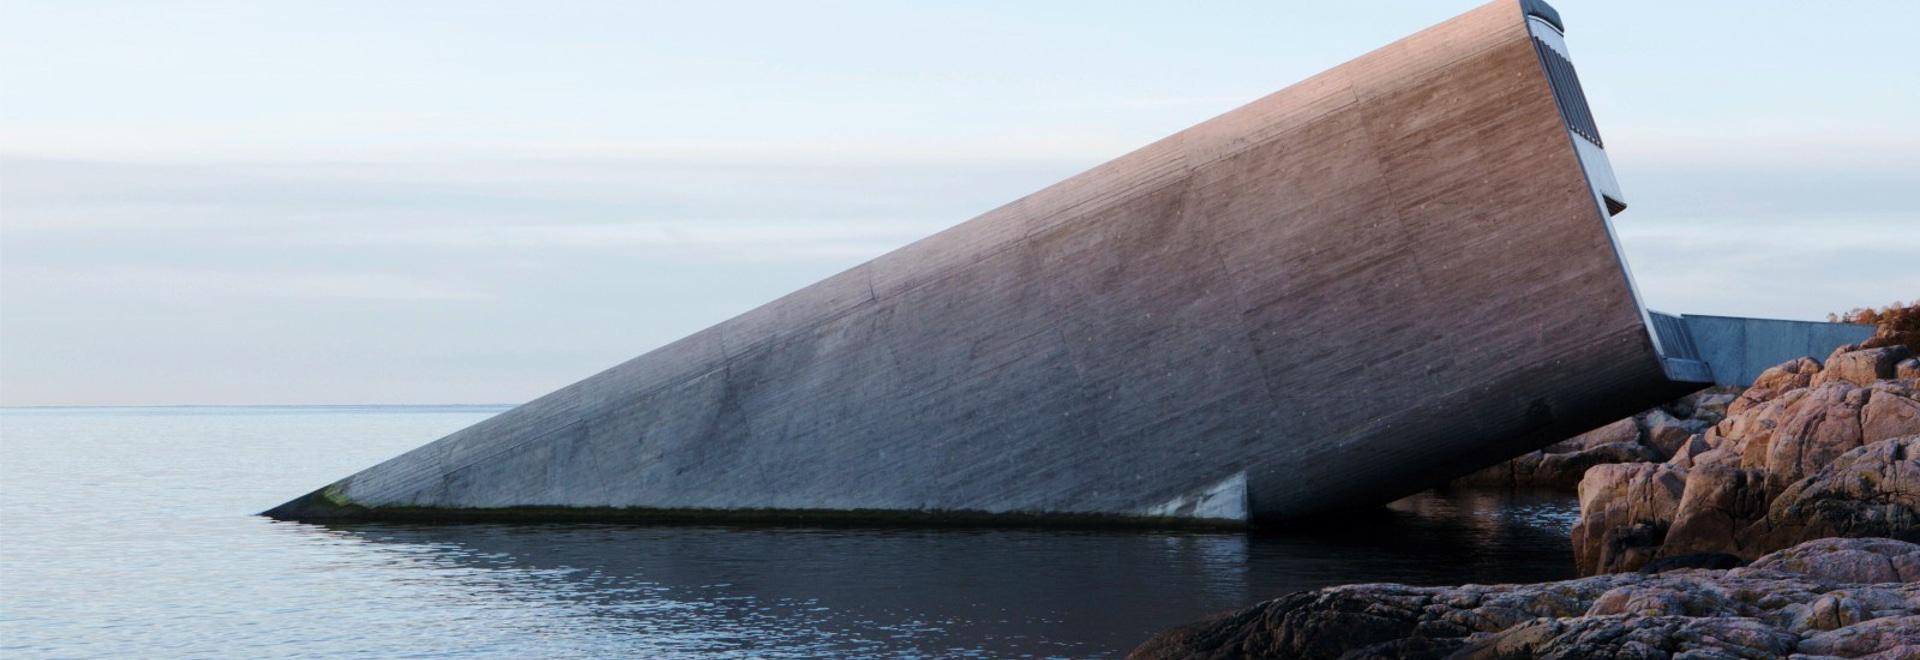 "Snøhetta completa ""Under"", el primer restaurante submarino de Europa"